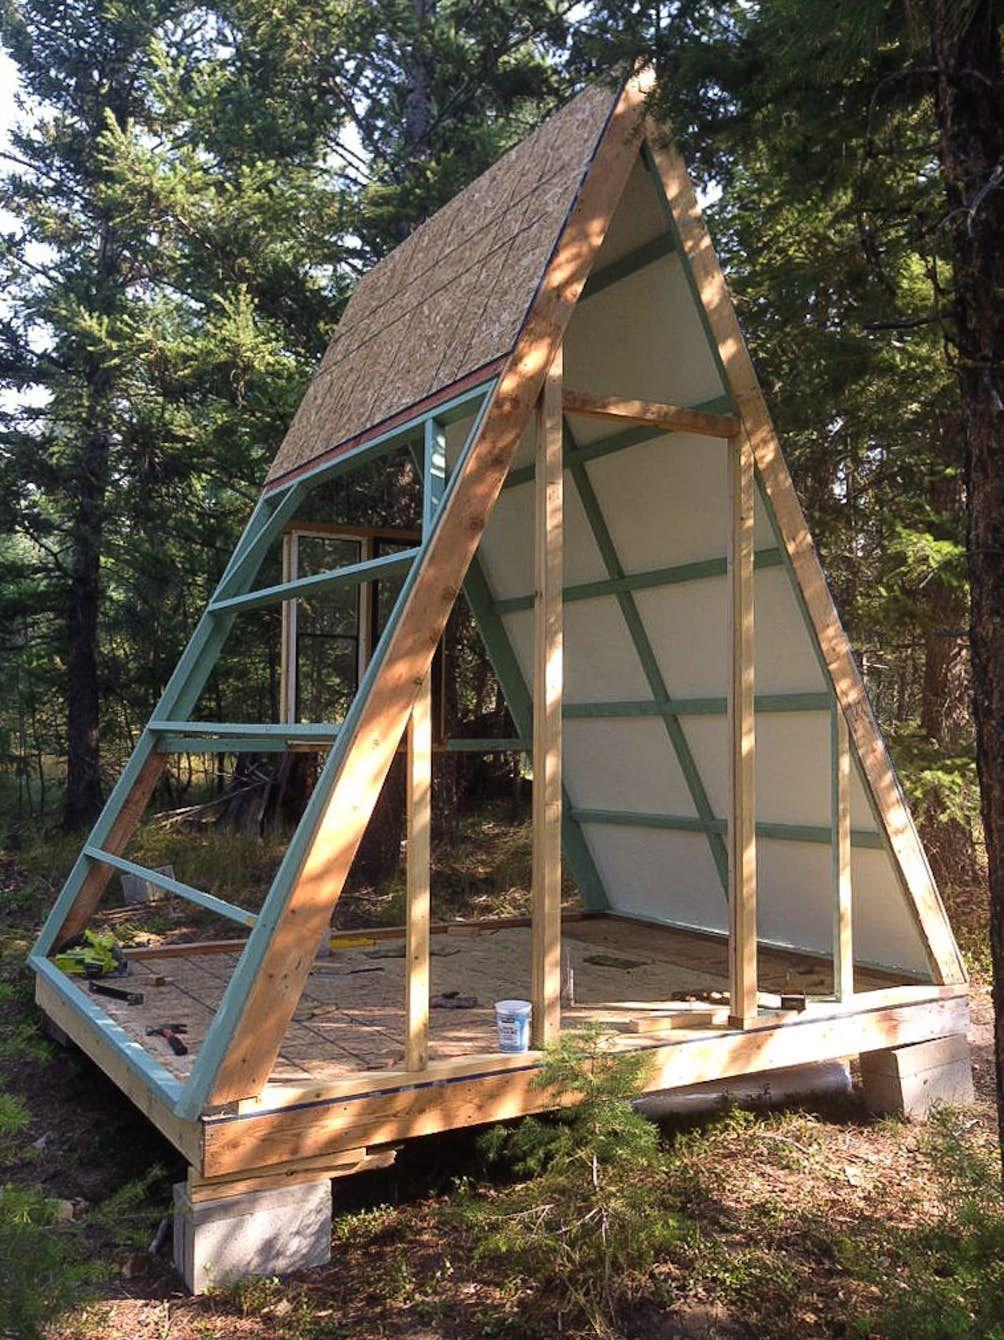 Building The Cabin Productividad A Frame Cabin A Frame House A Frame Cabin Plans